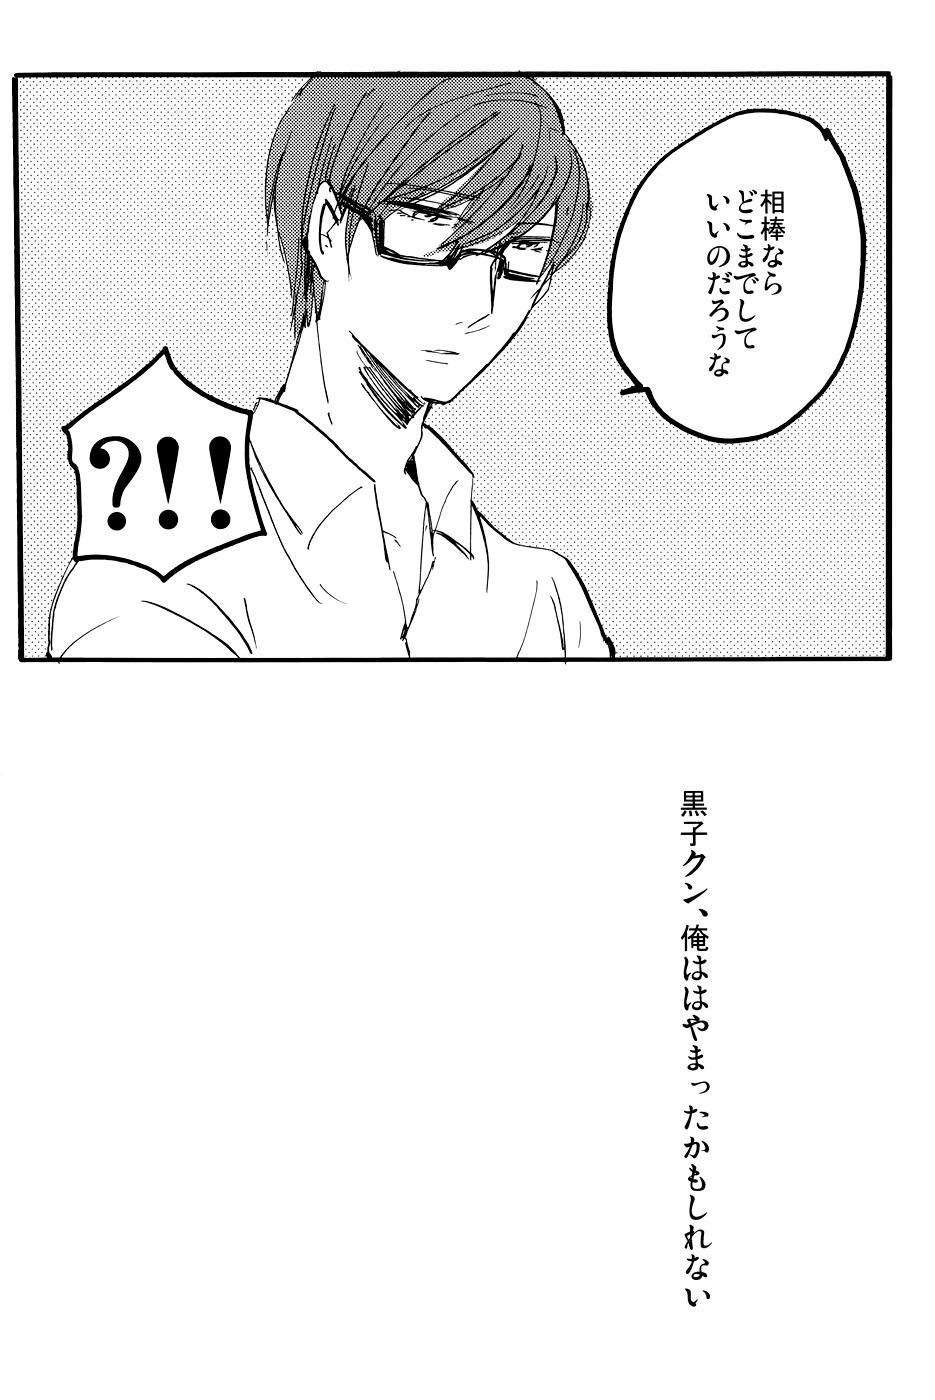 b_0038_38